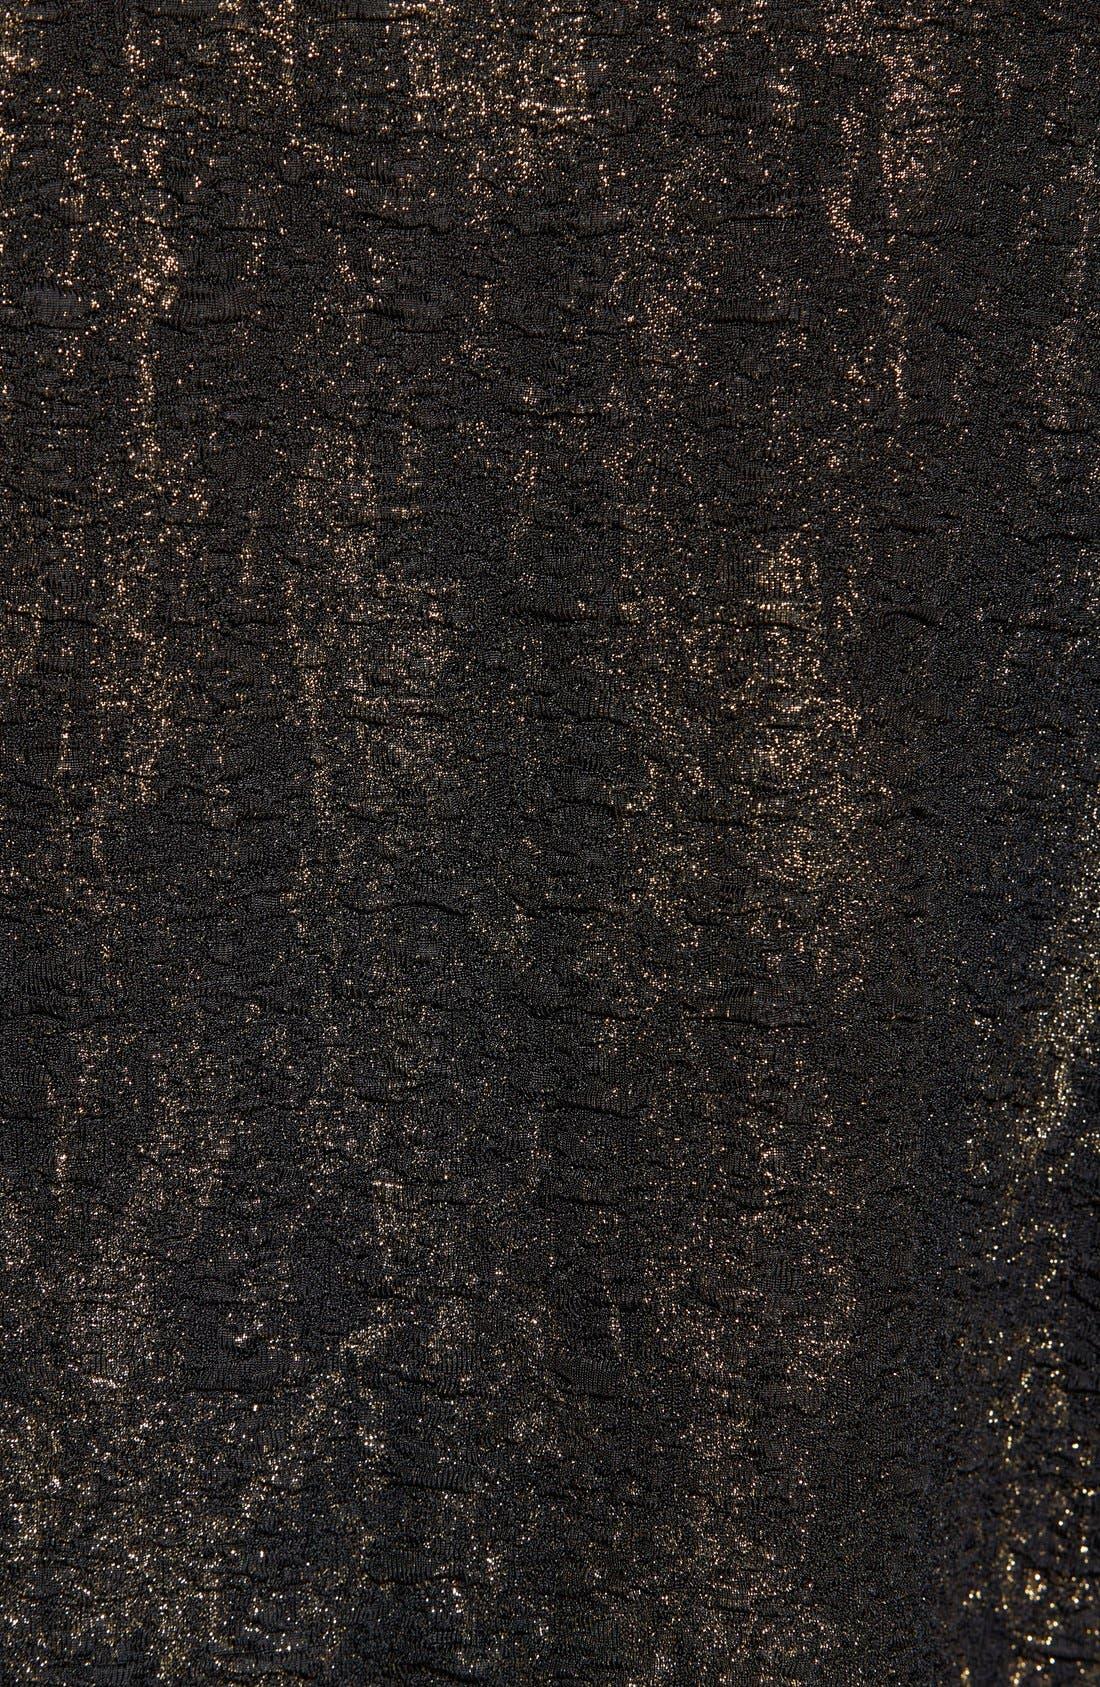 Shimmer Crop Top,                             Alternate thumbnail 5, color,                             001